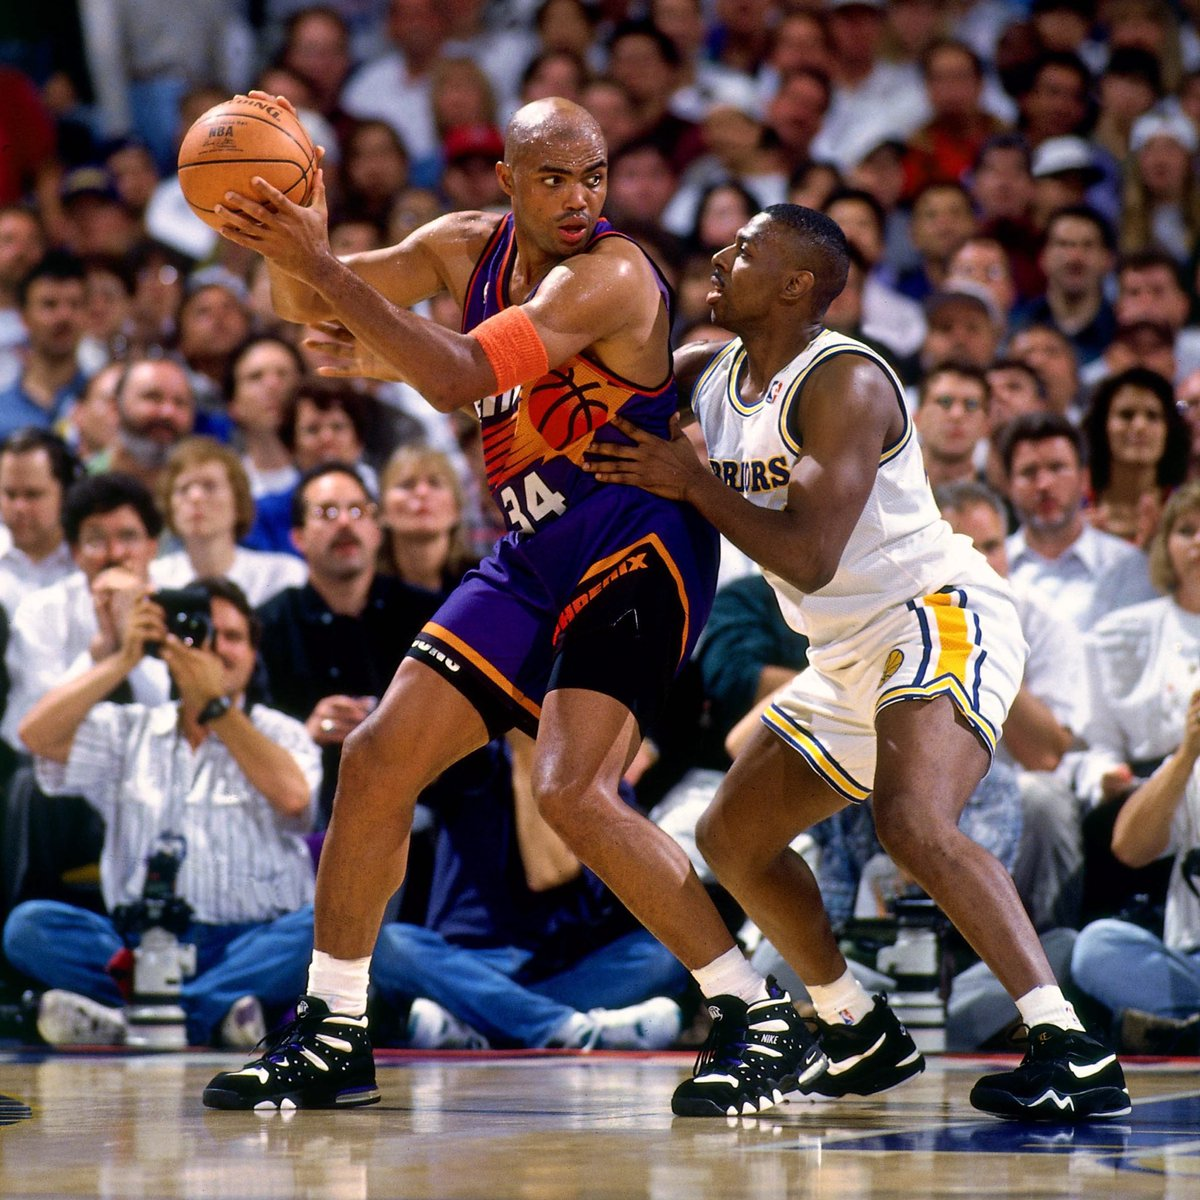 1994, Charles Barkley lit up the Golden